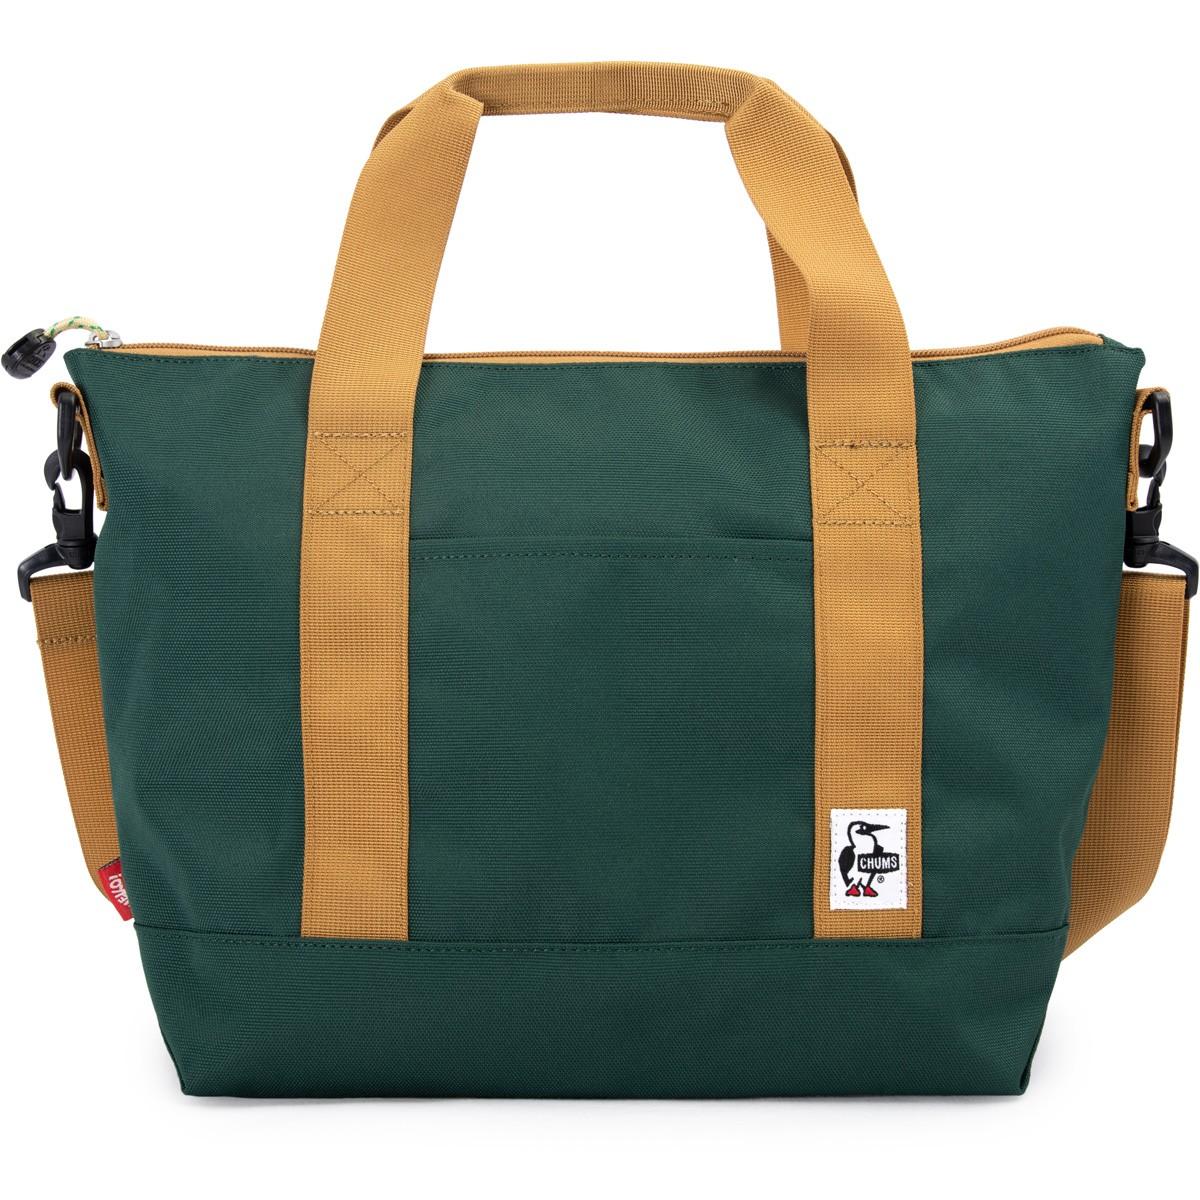 CHUMS チャムス エコ トートバッグ Eco Tote Bag II